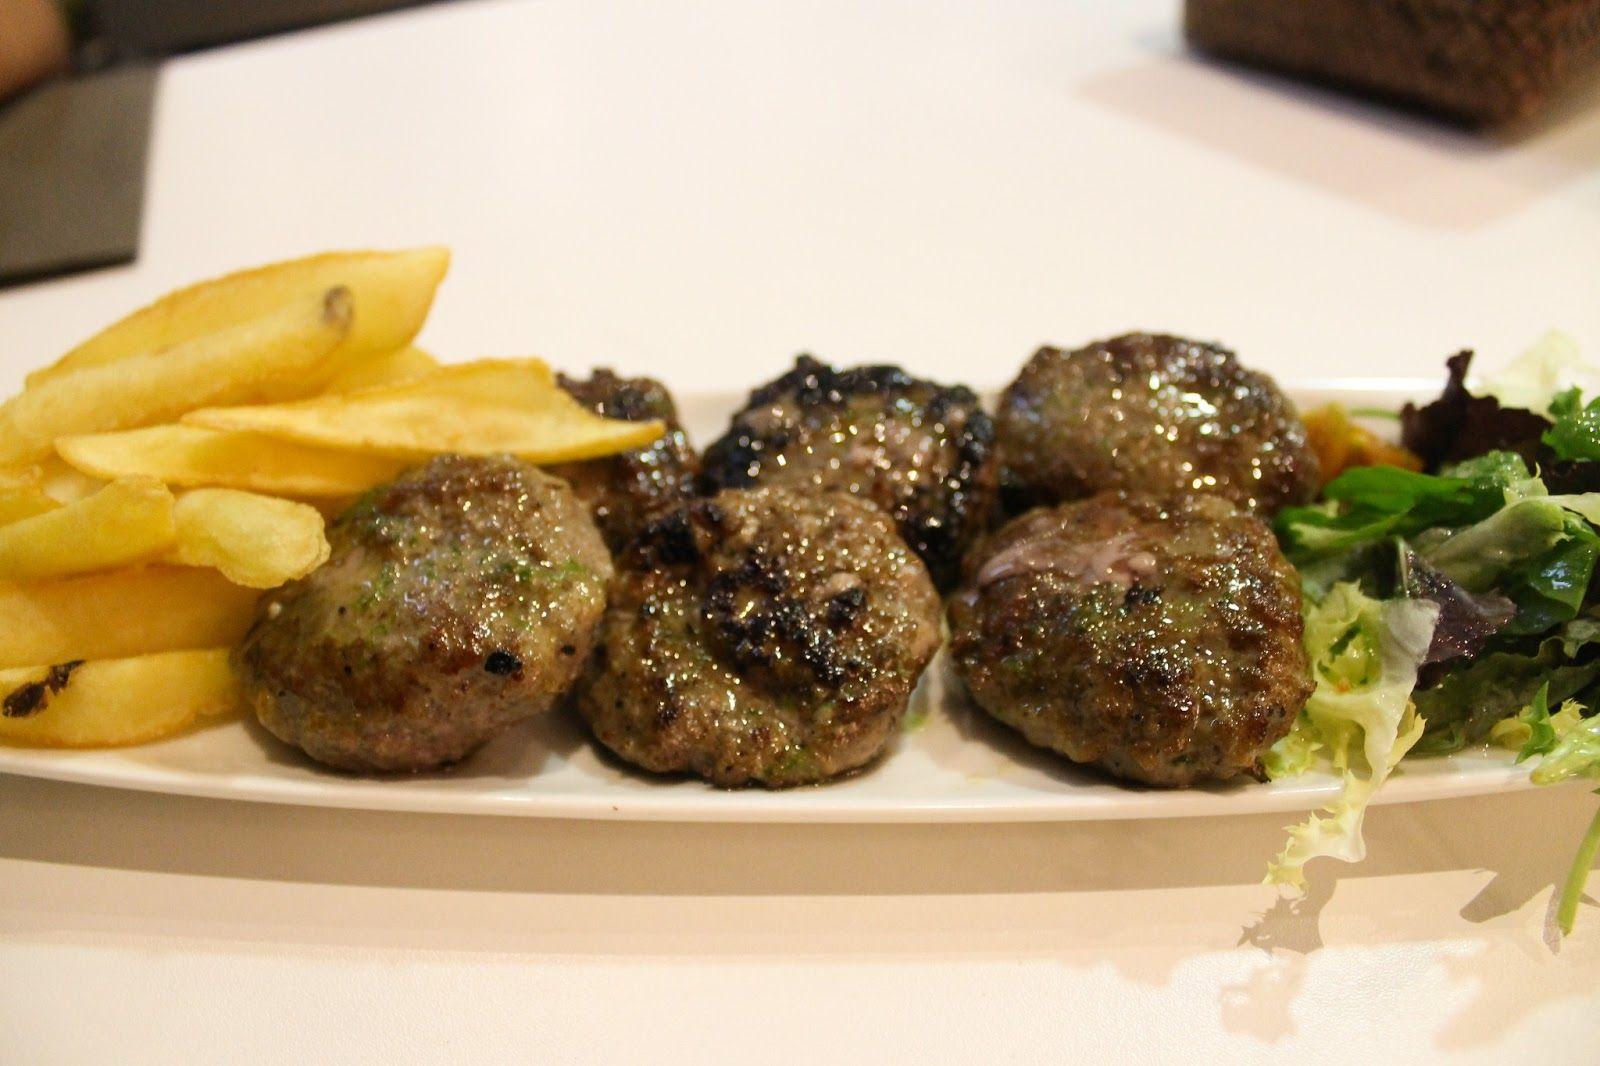 Surtido de minihamburguesas: Dijon, Cabrales y Boletus - Hatari Urban Kitchen, Bilbao